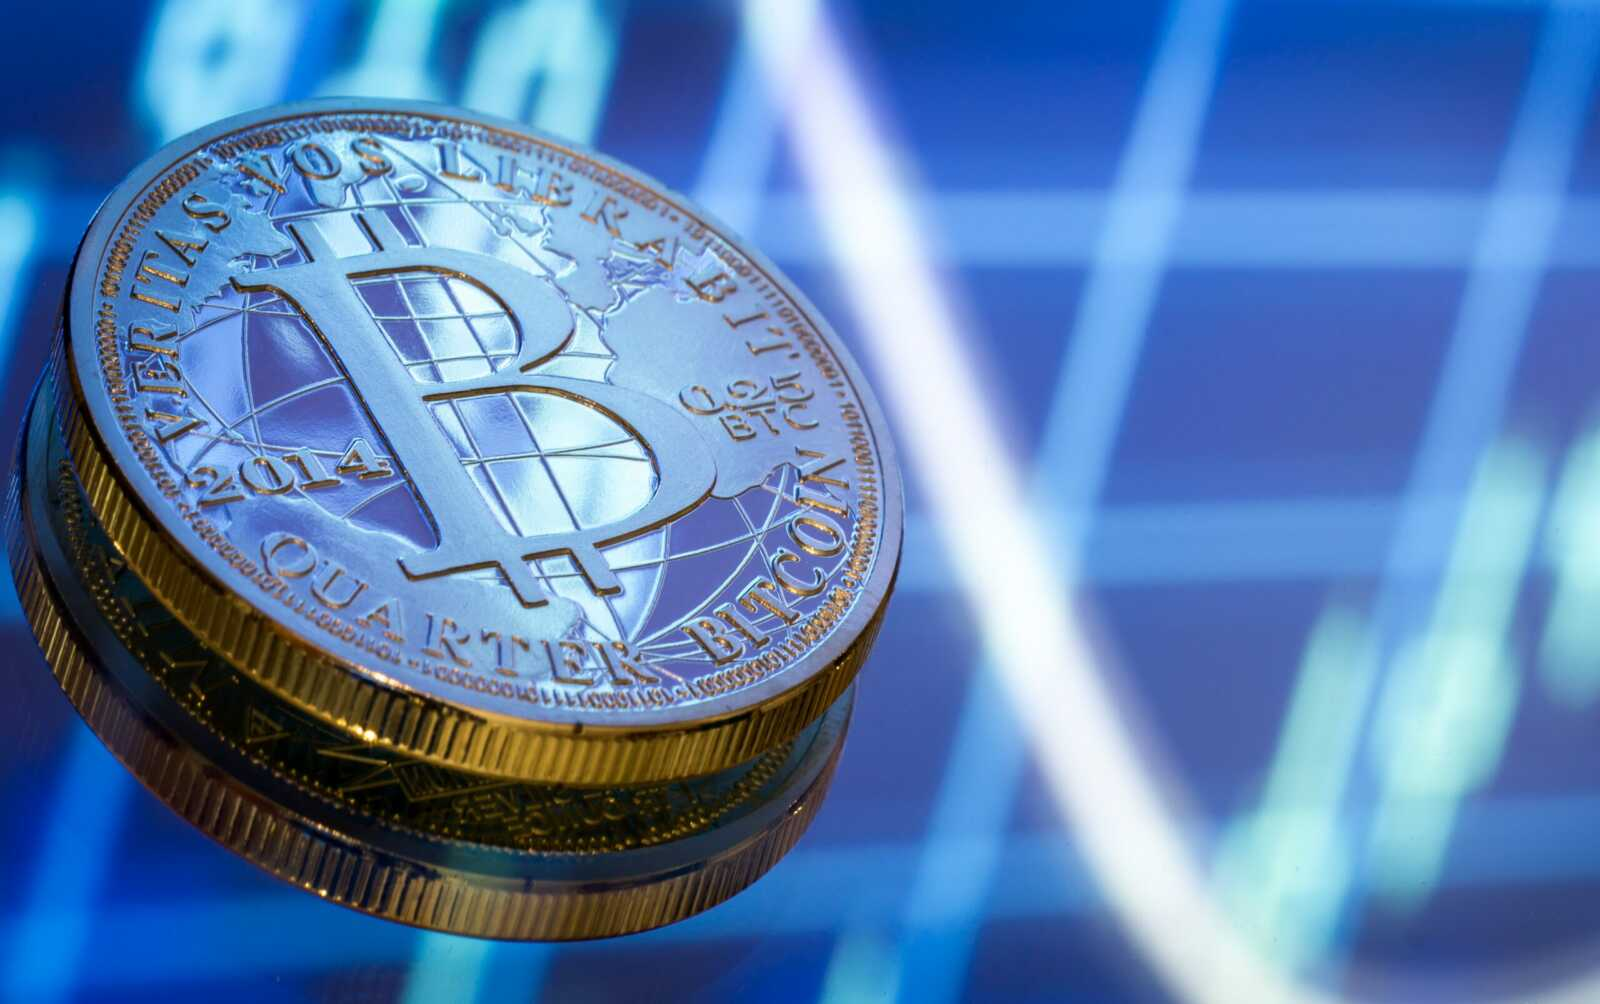 jp morgan bitcoin 40 000 dolari asamazsa duzeltmeyle karsilasabilir 6021181431964 scaled